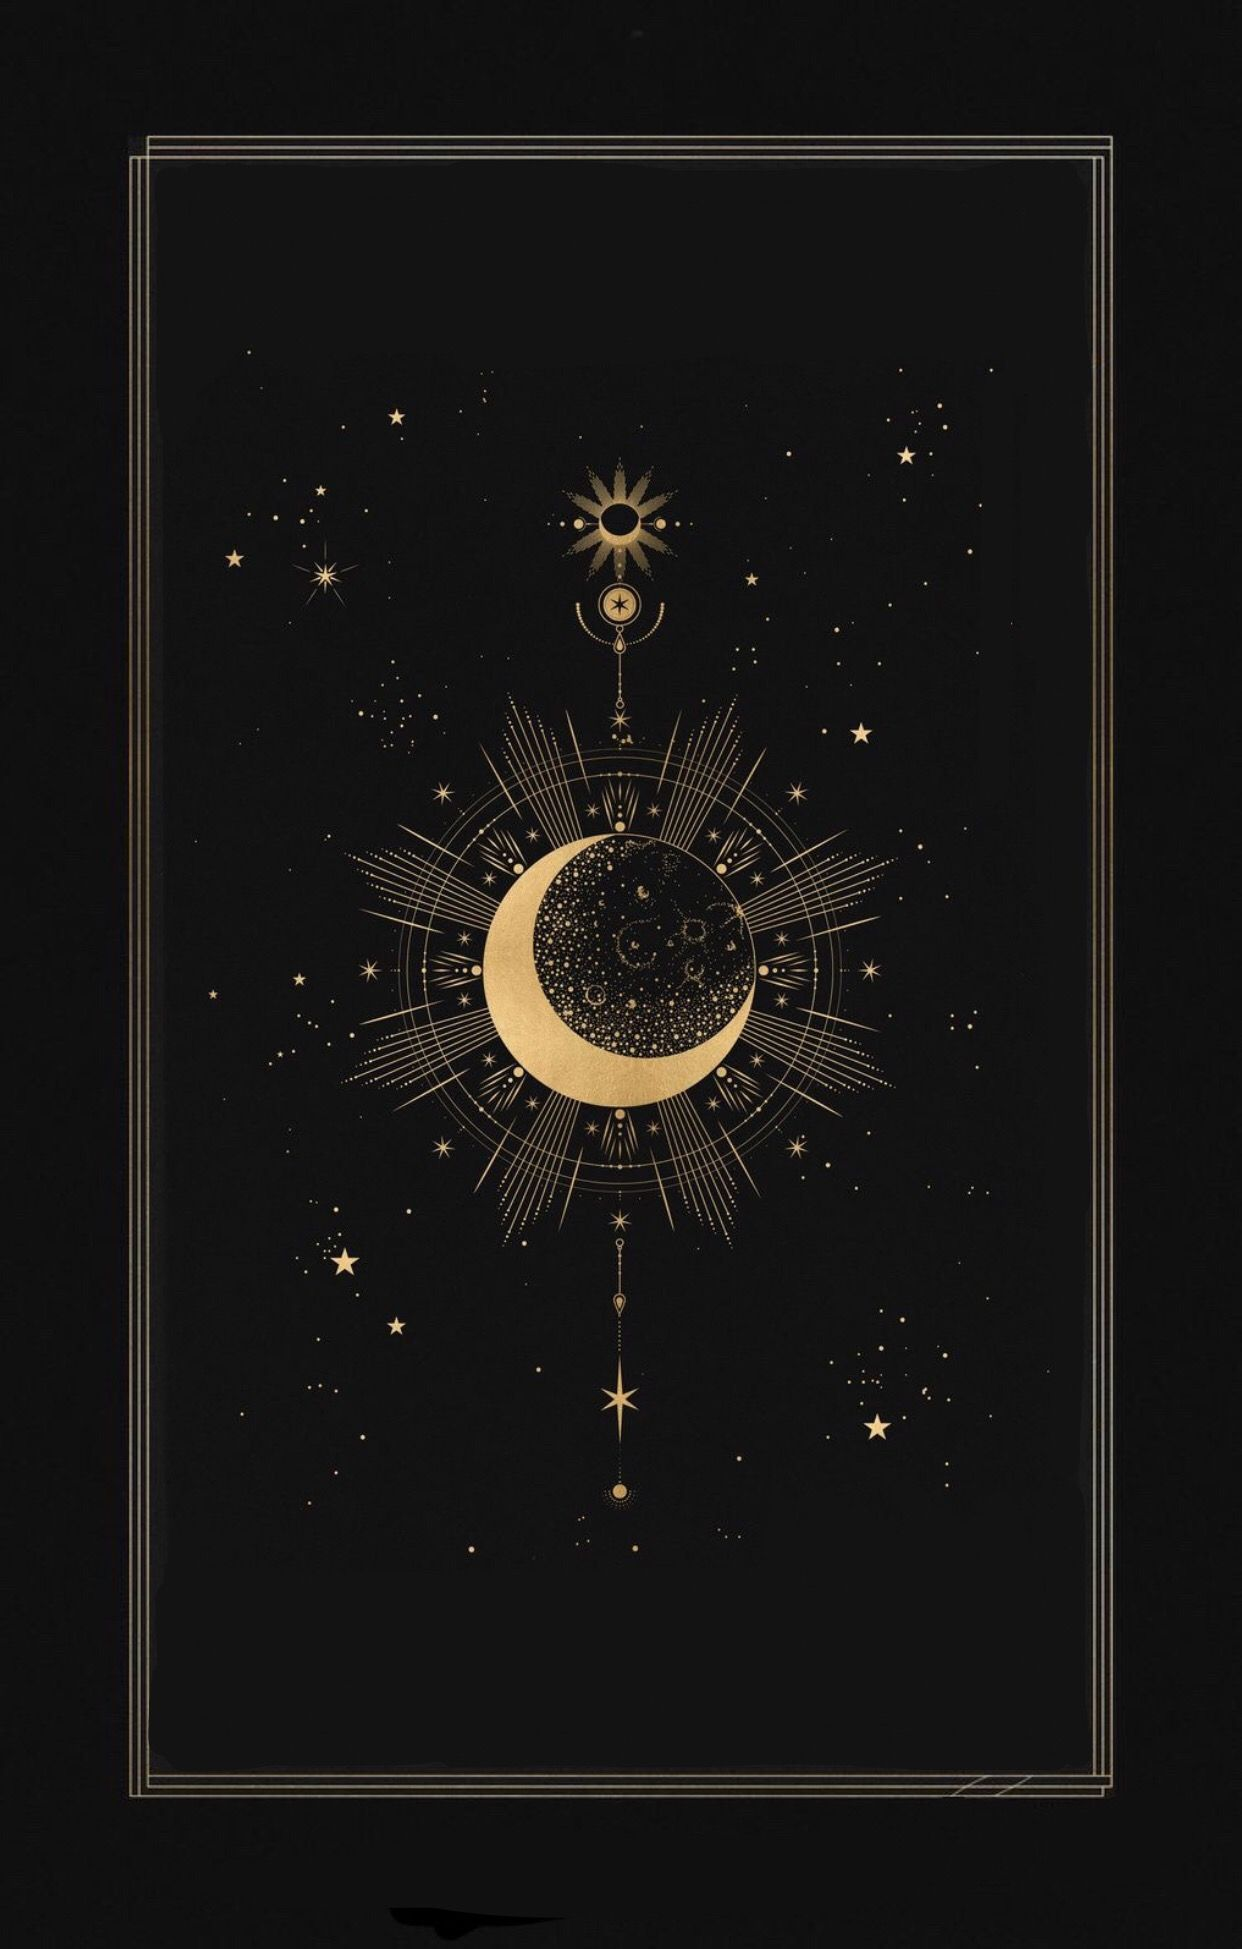 Pin By Honeymochi On Aesthetics Celestial Art Witchy Wallpaper Moon Art